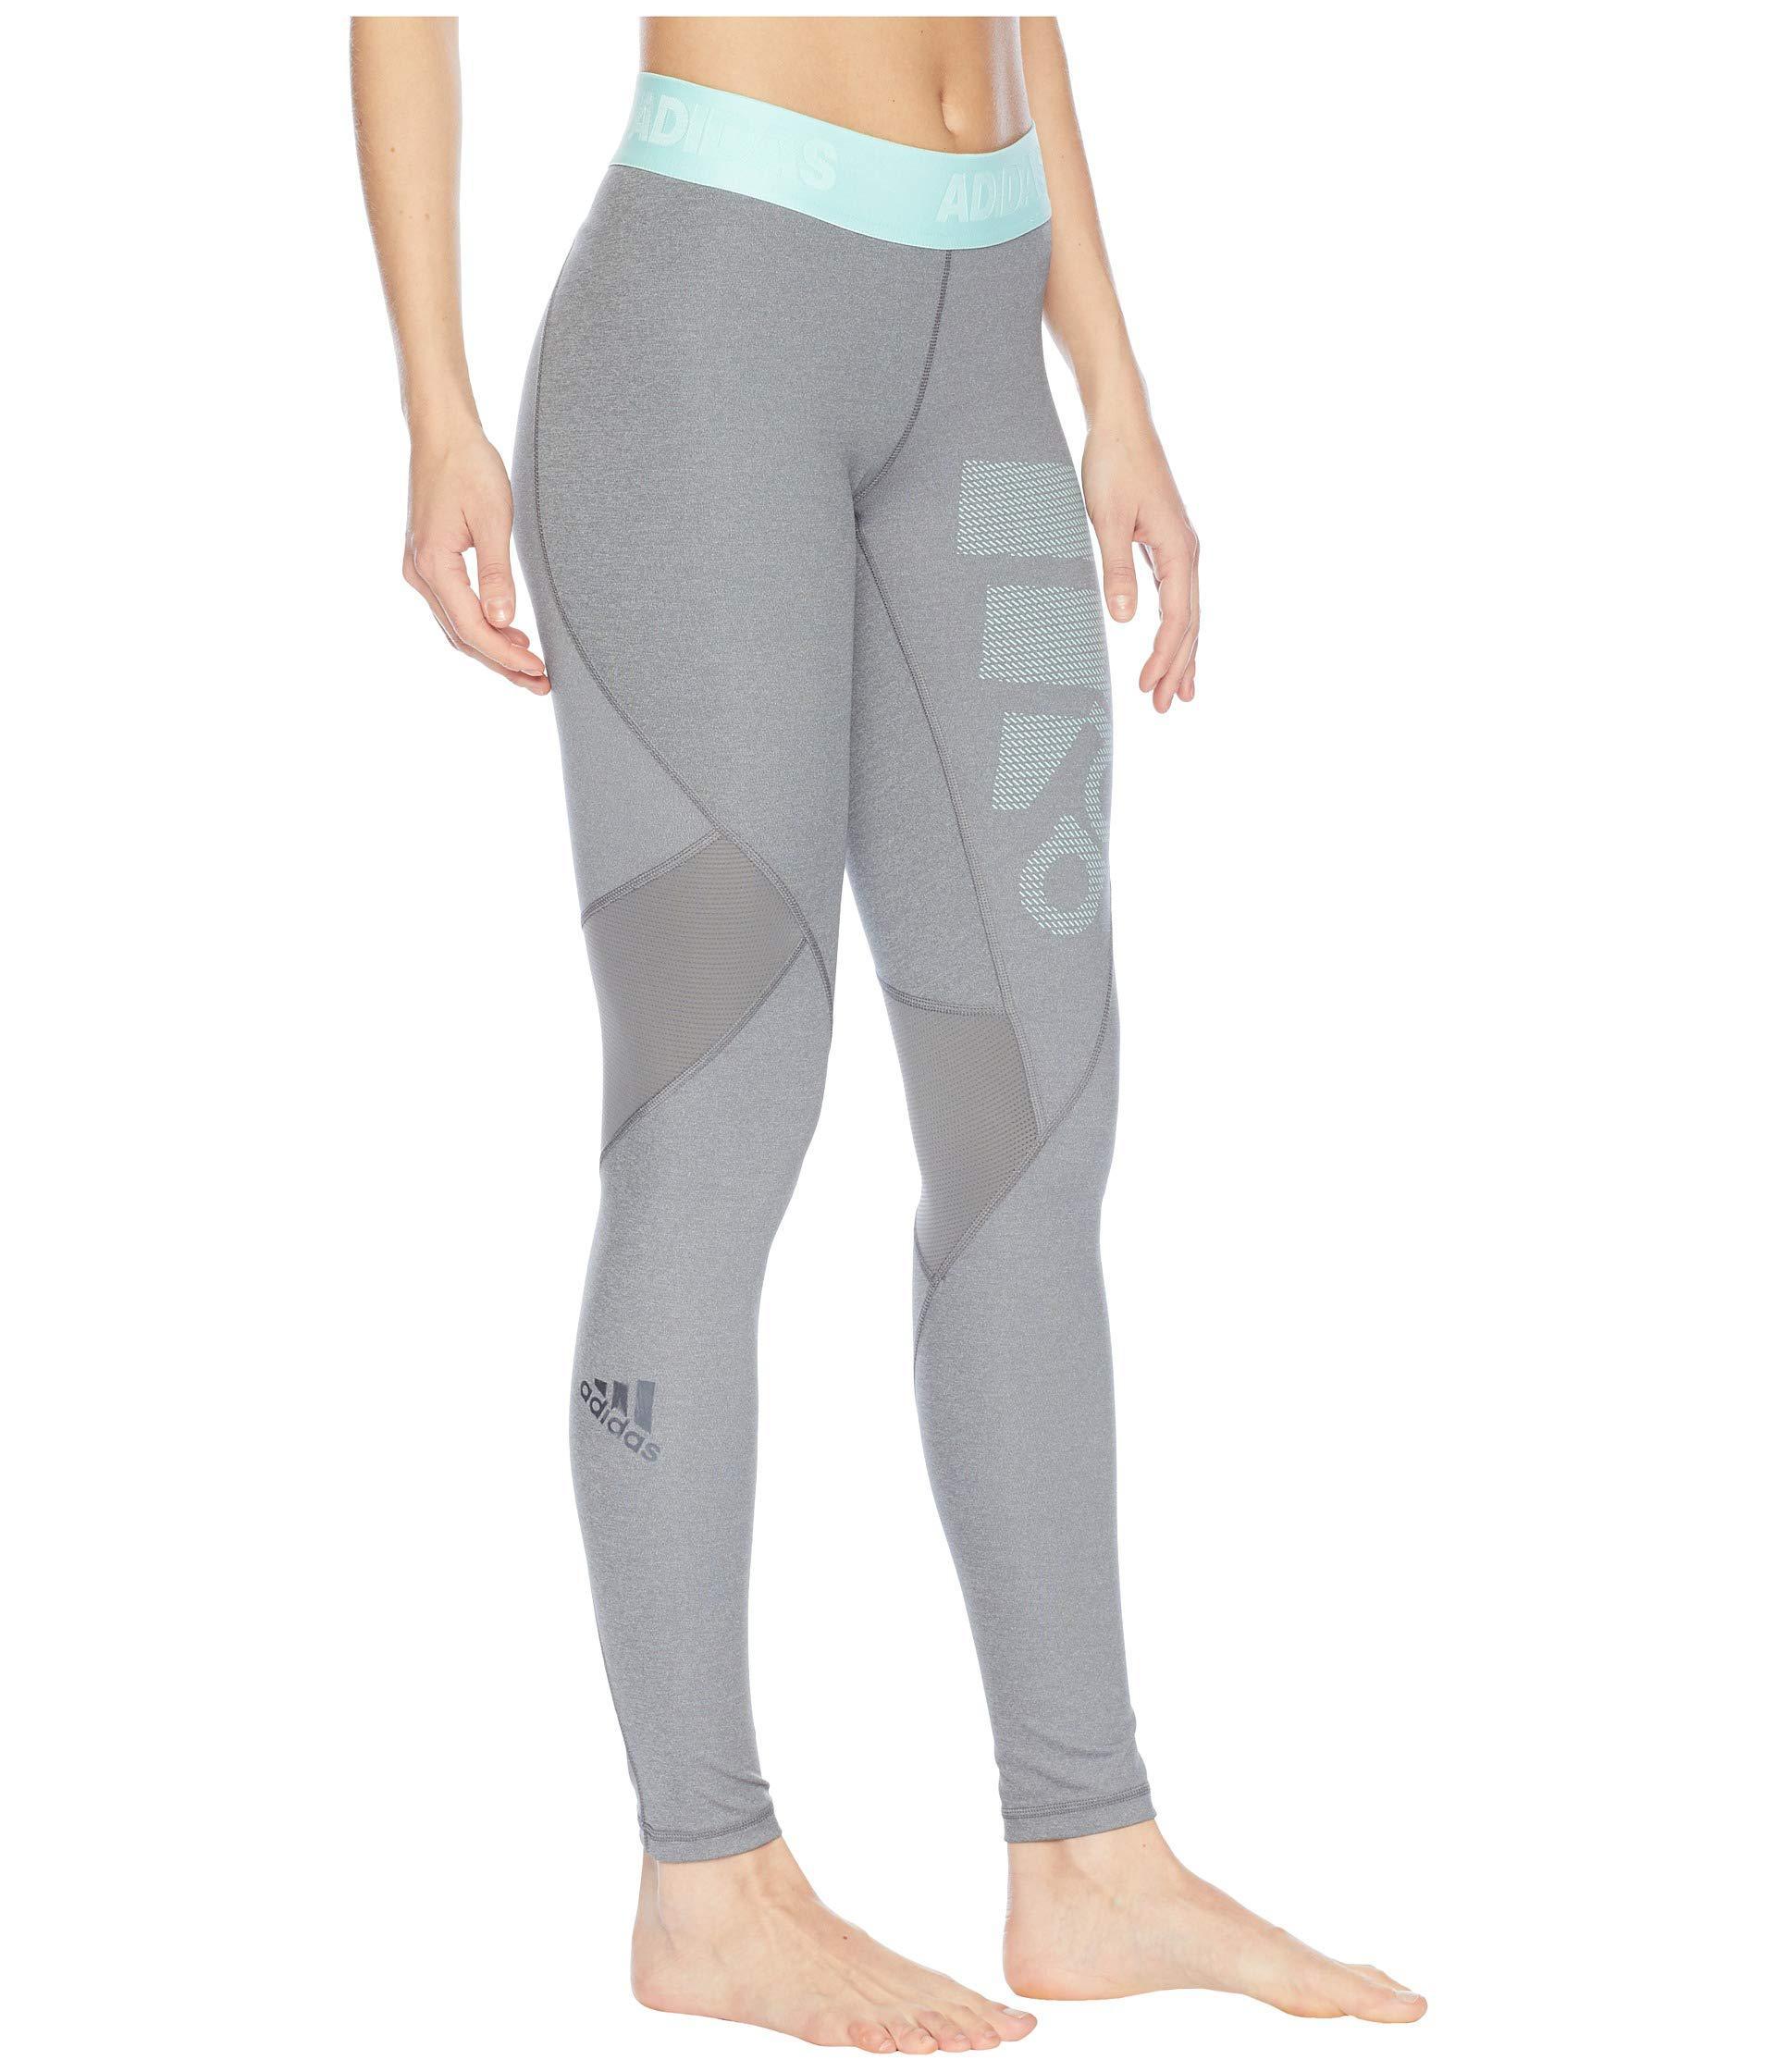 Lyst - adidas Alphaskin Sport Long Logo Tights (dark Grey Heather ... e00b1010d2c